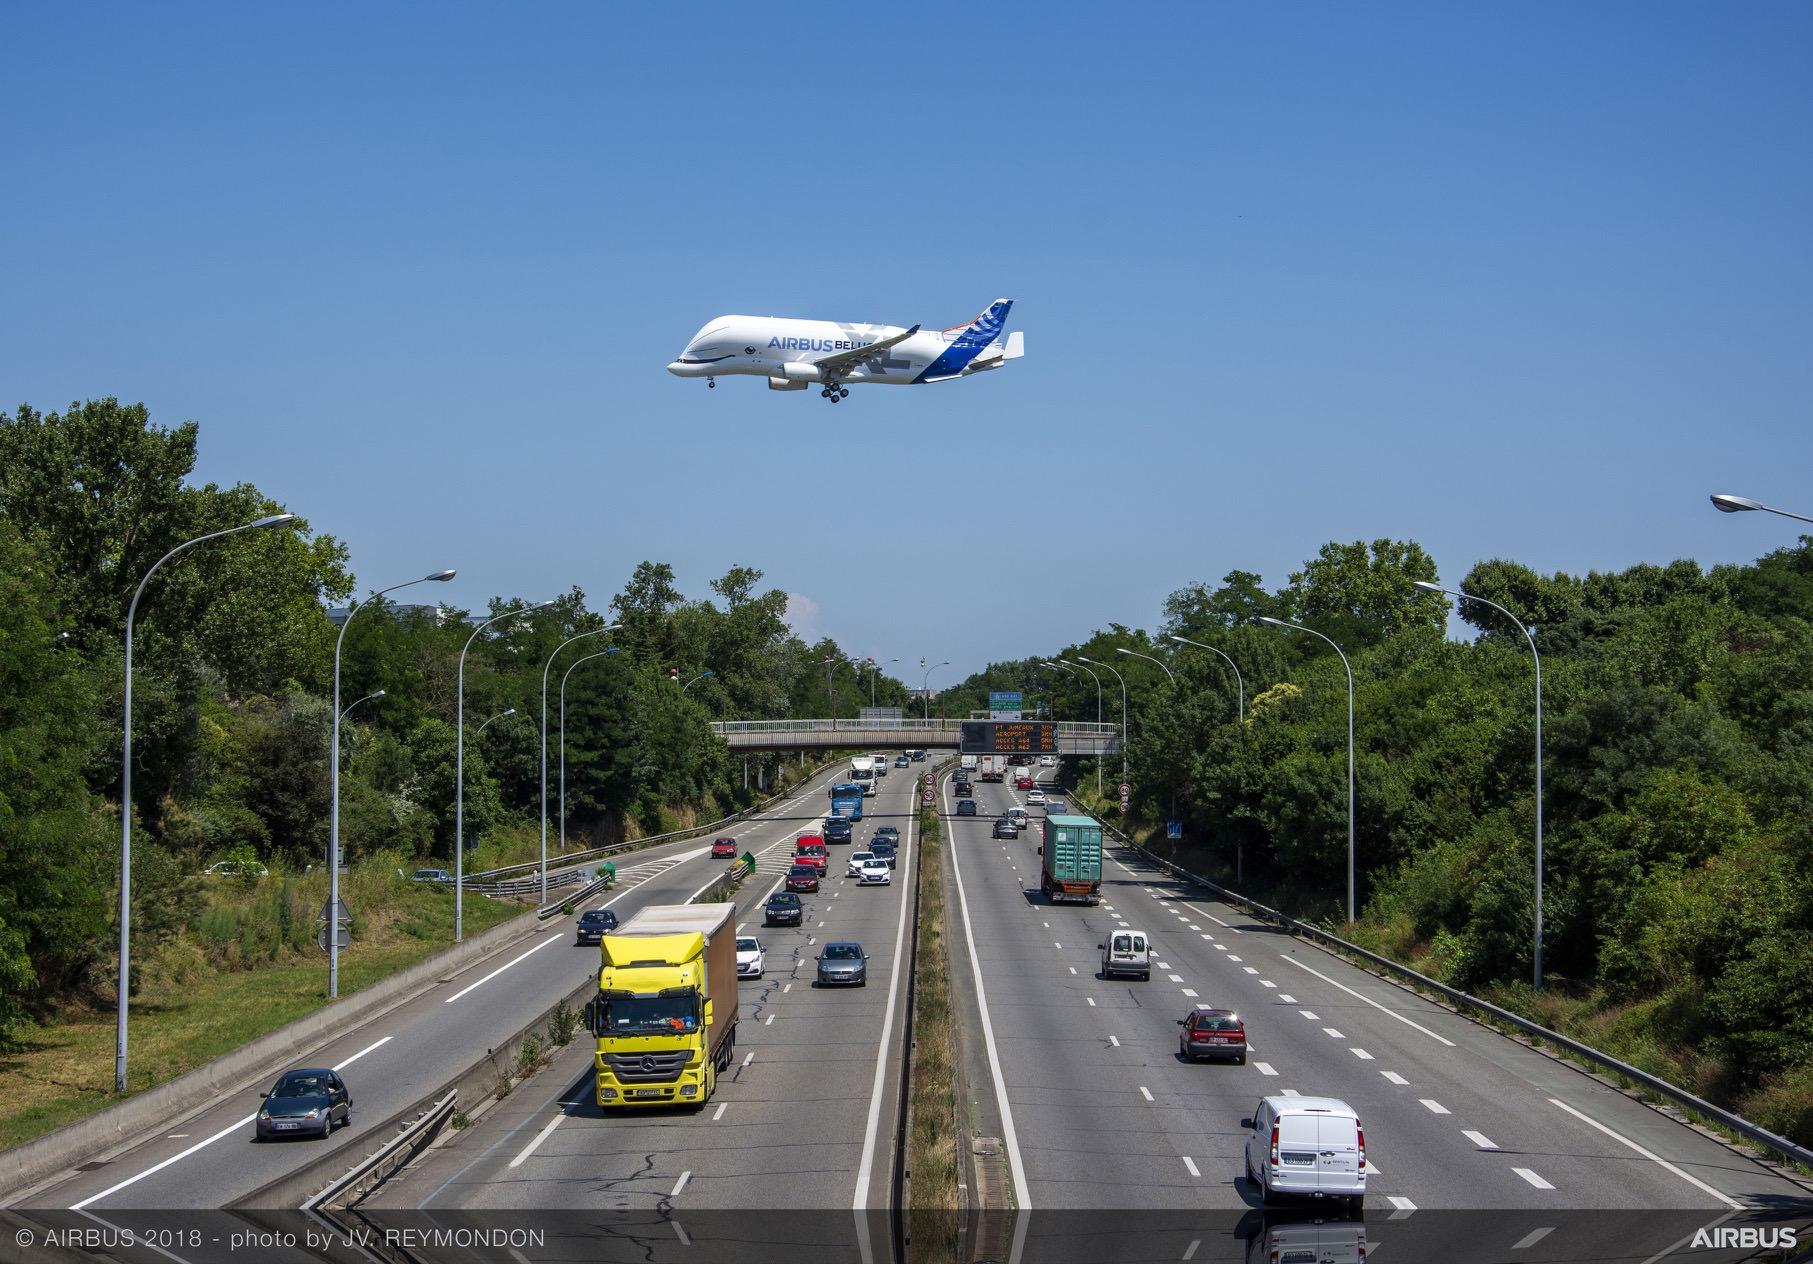 BelugaXL-First-Flight-Low-Pass-002